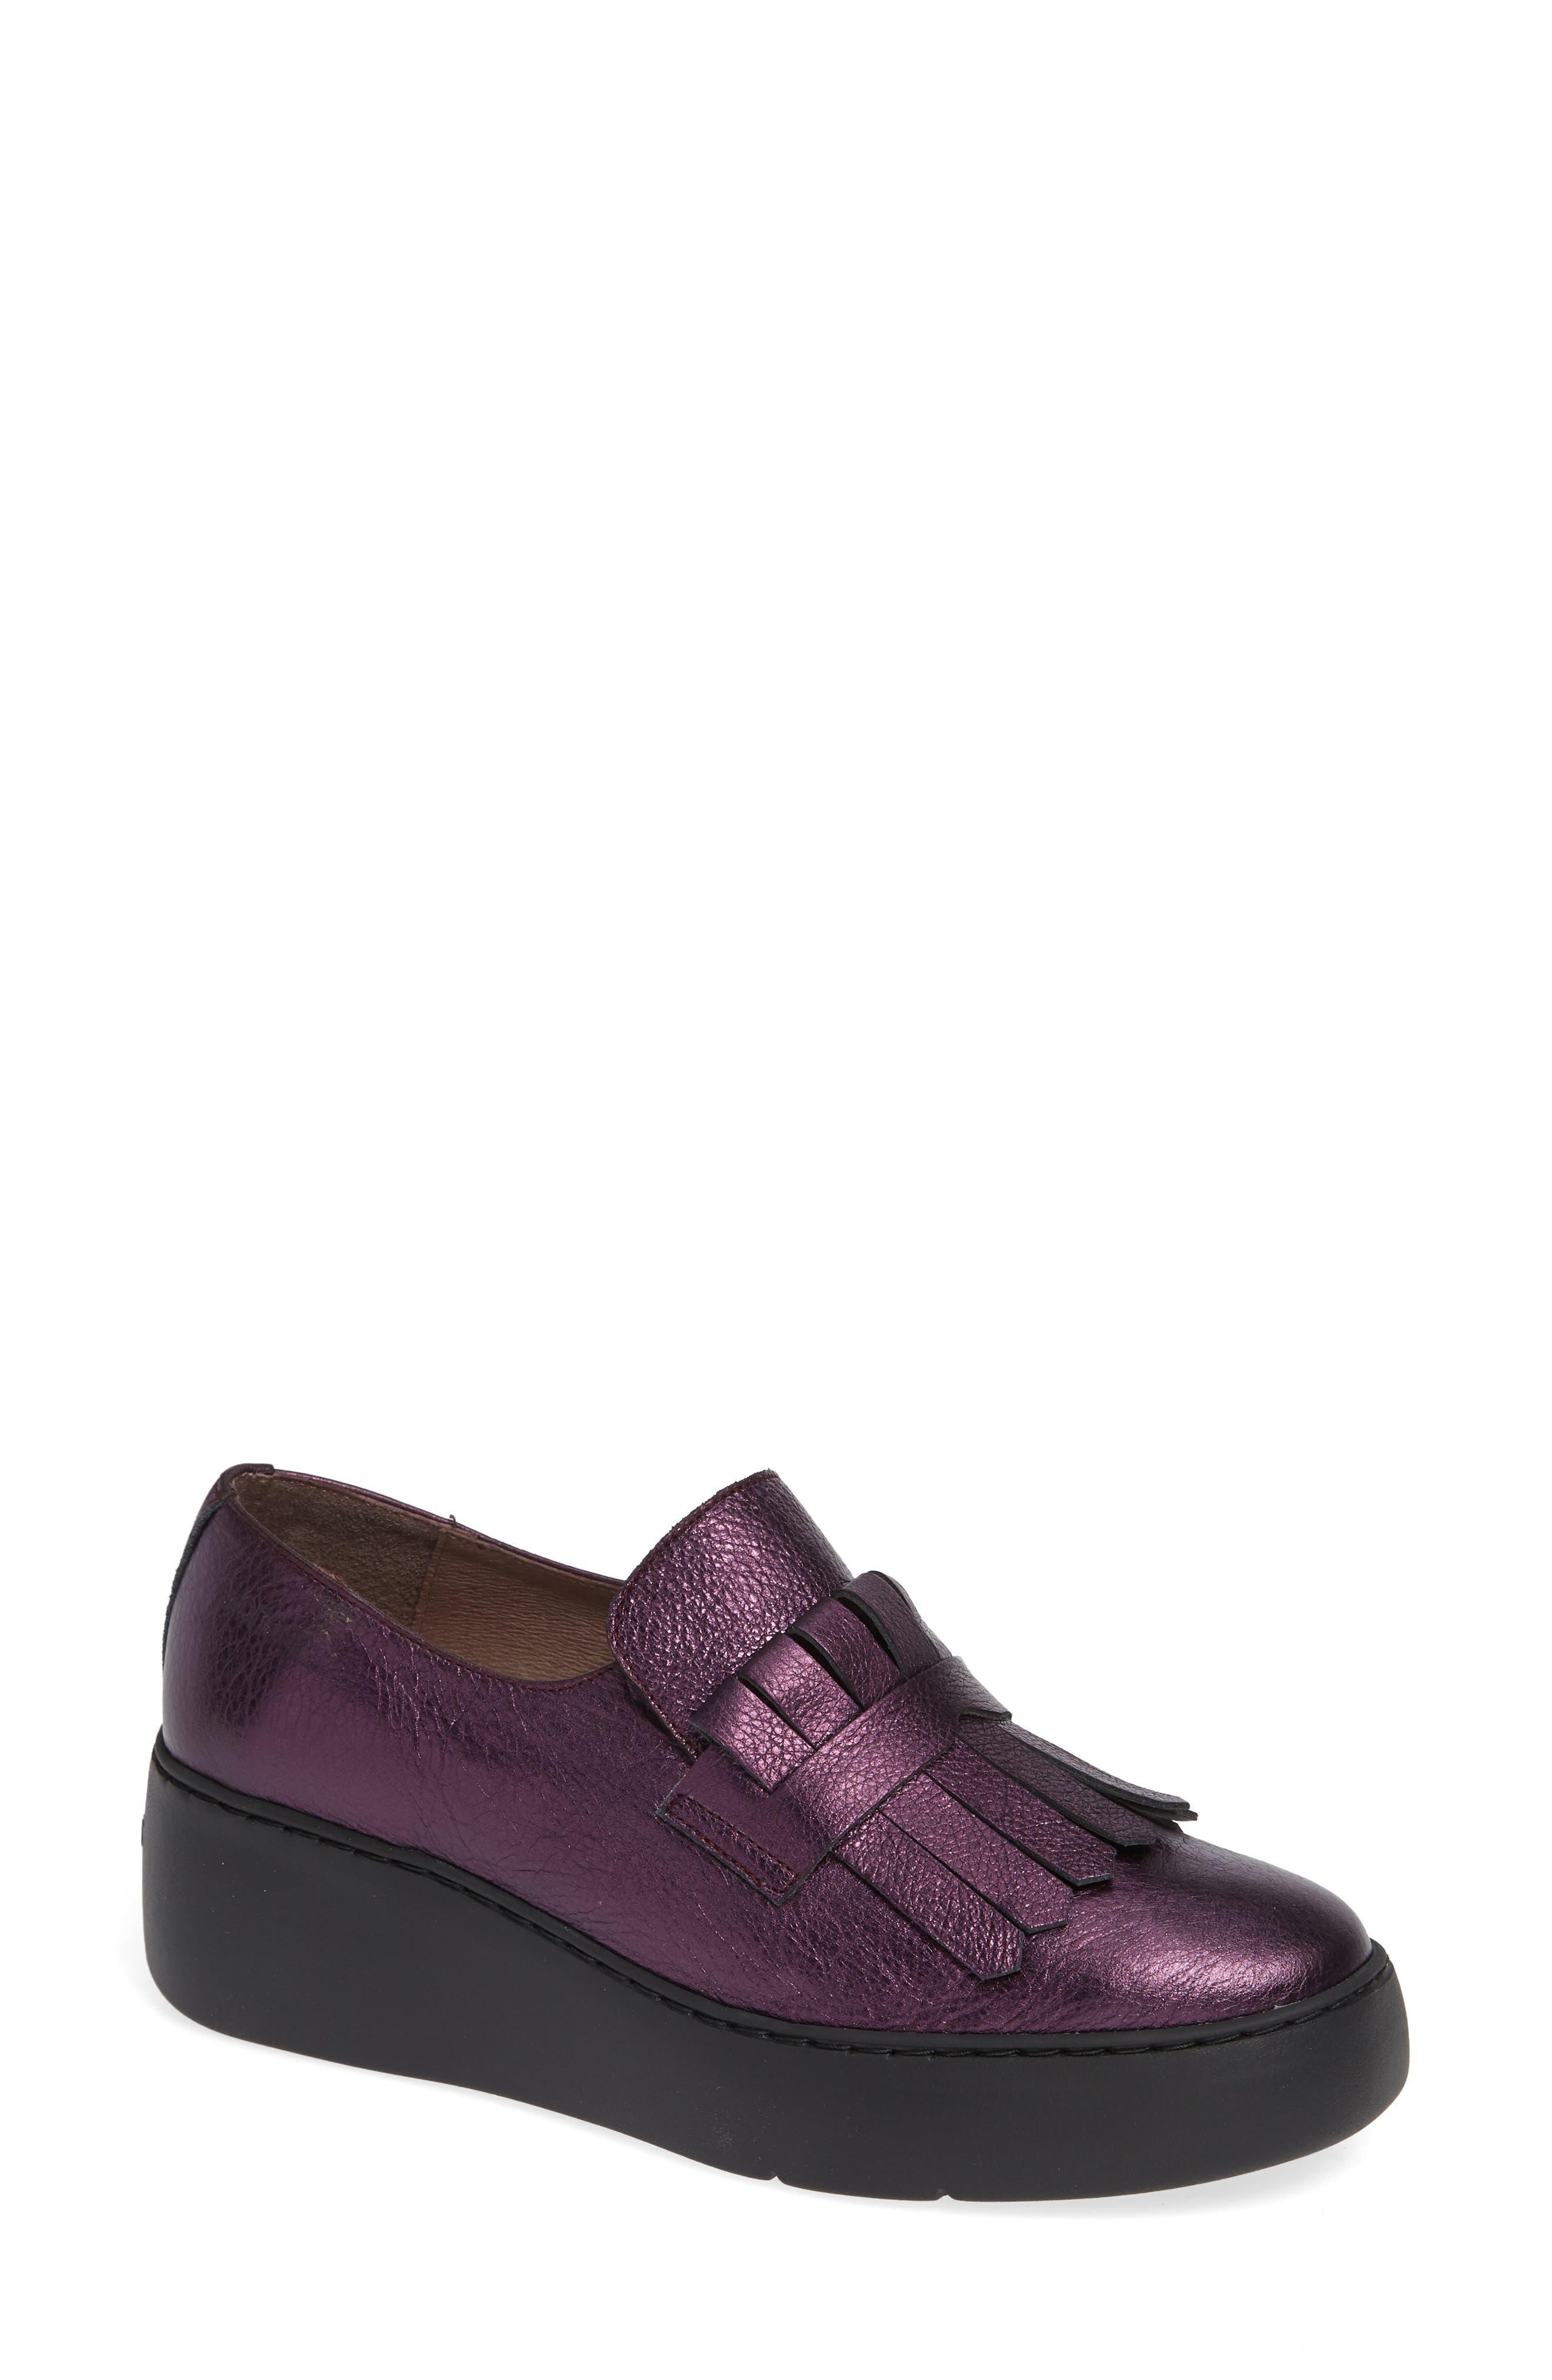 Wonders Kiltie Platform Loafer, Purple